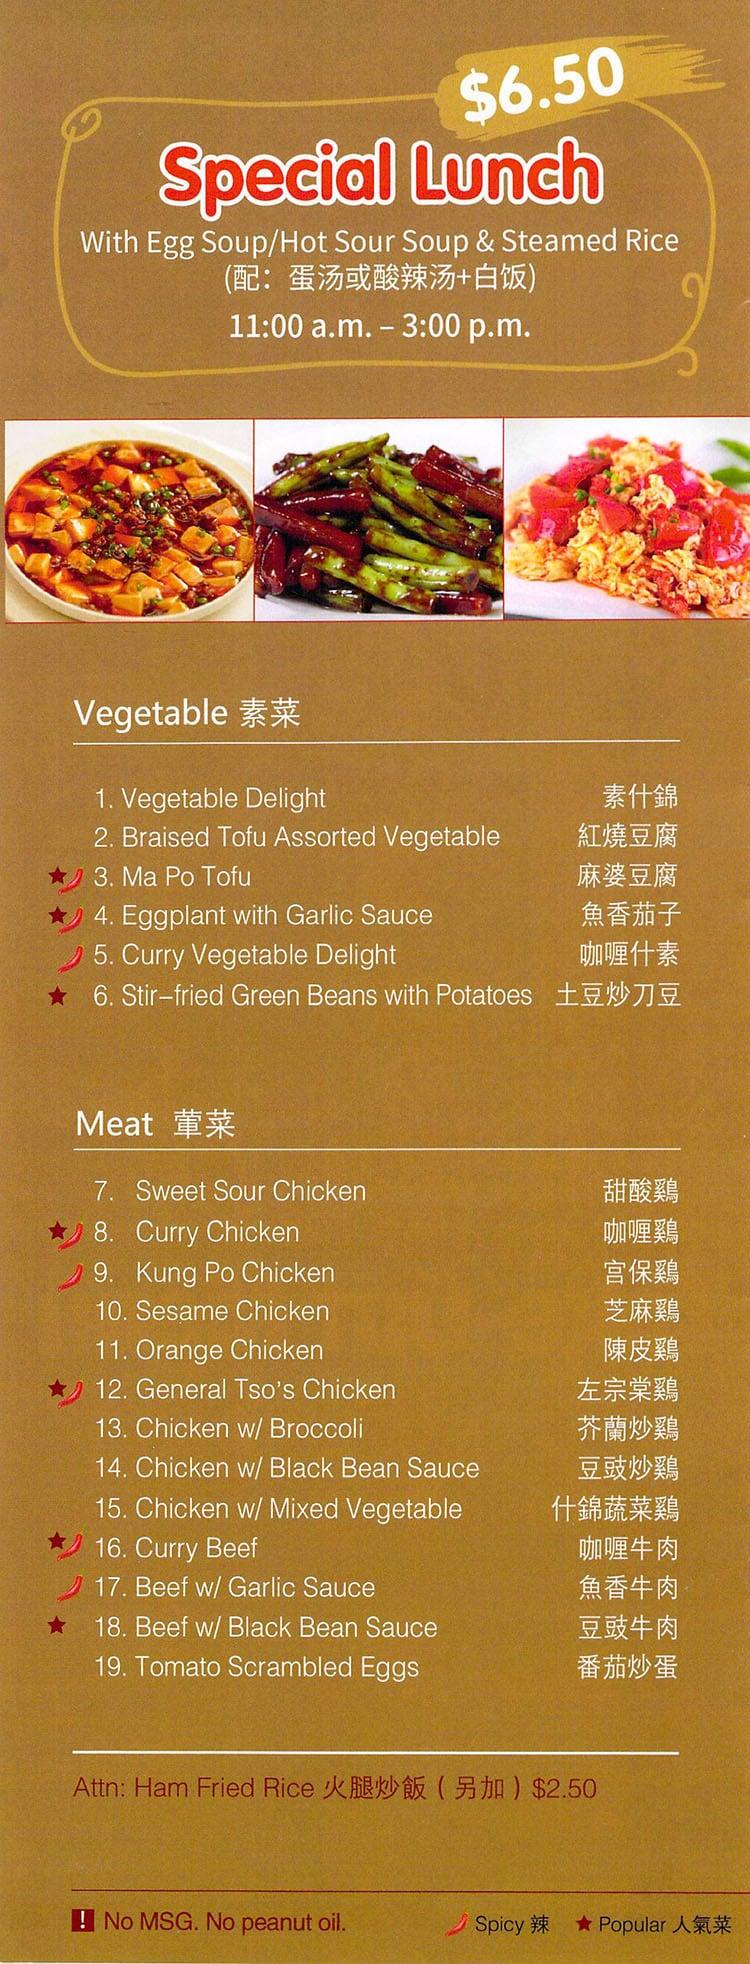 Boba World menu - lunch specials